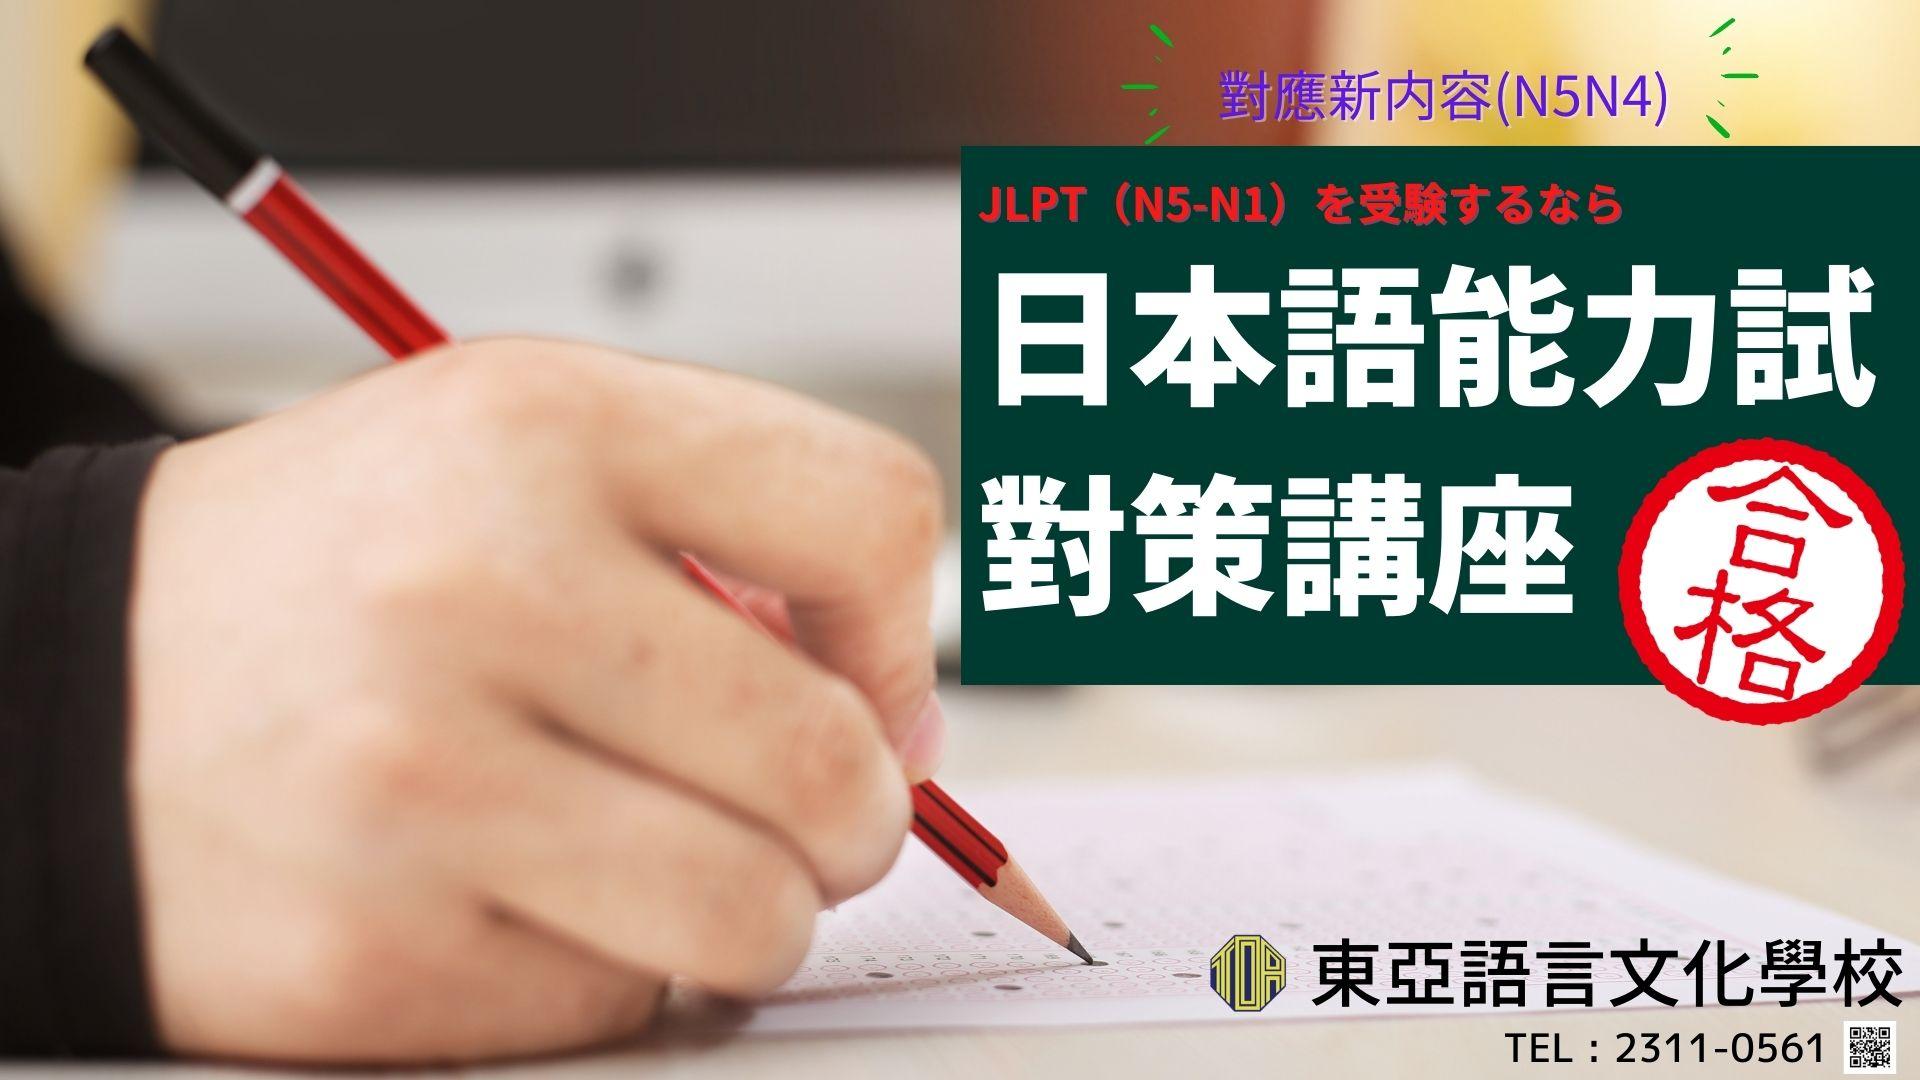 hongkong toa japanese school cantonese chinese 香港 東亞 日文 日本語 広東語 北京語 中国語 日本語能力試験 JLPT